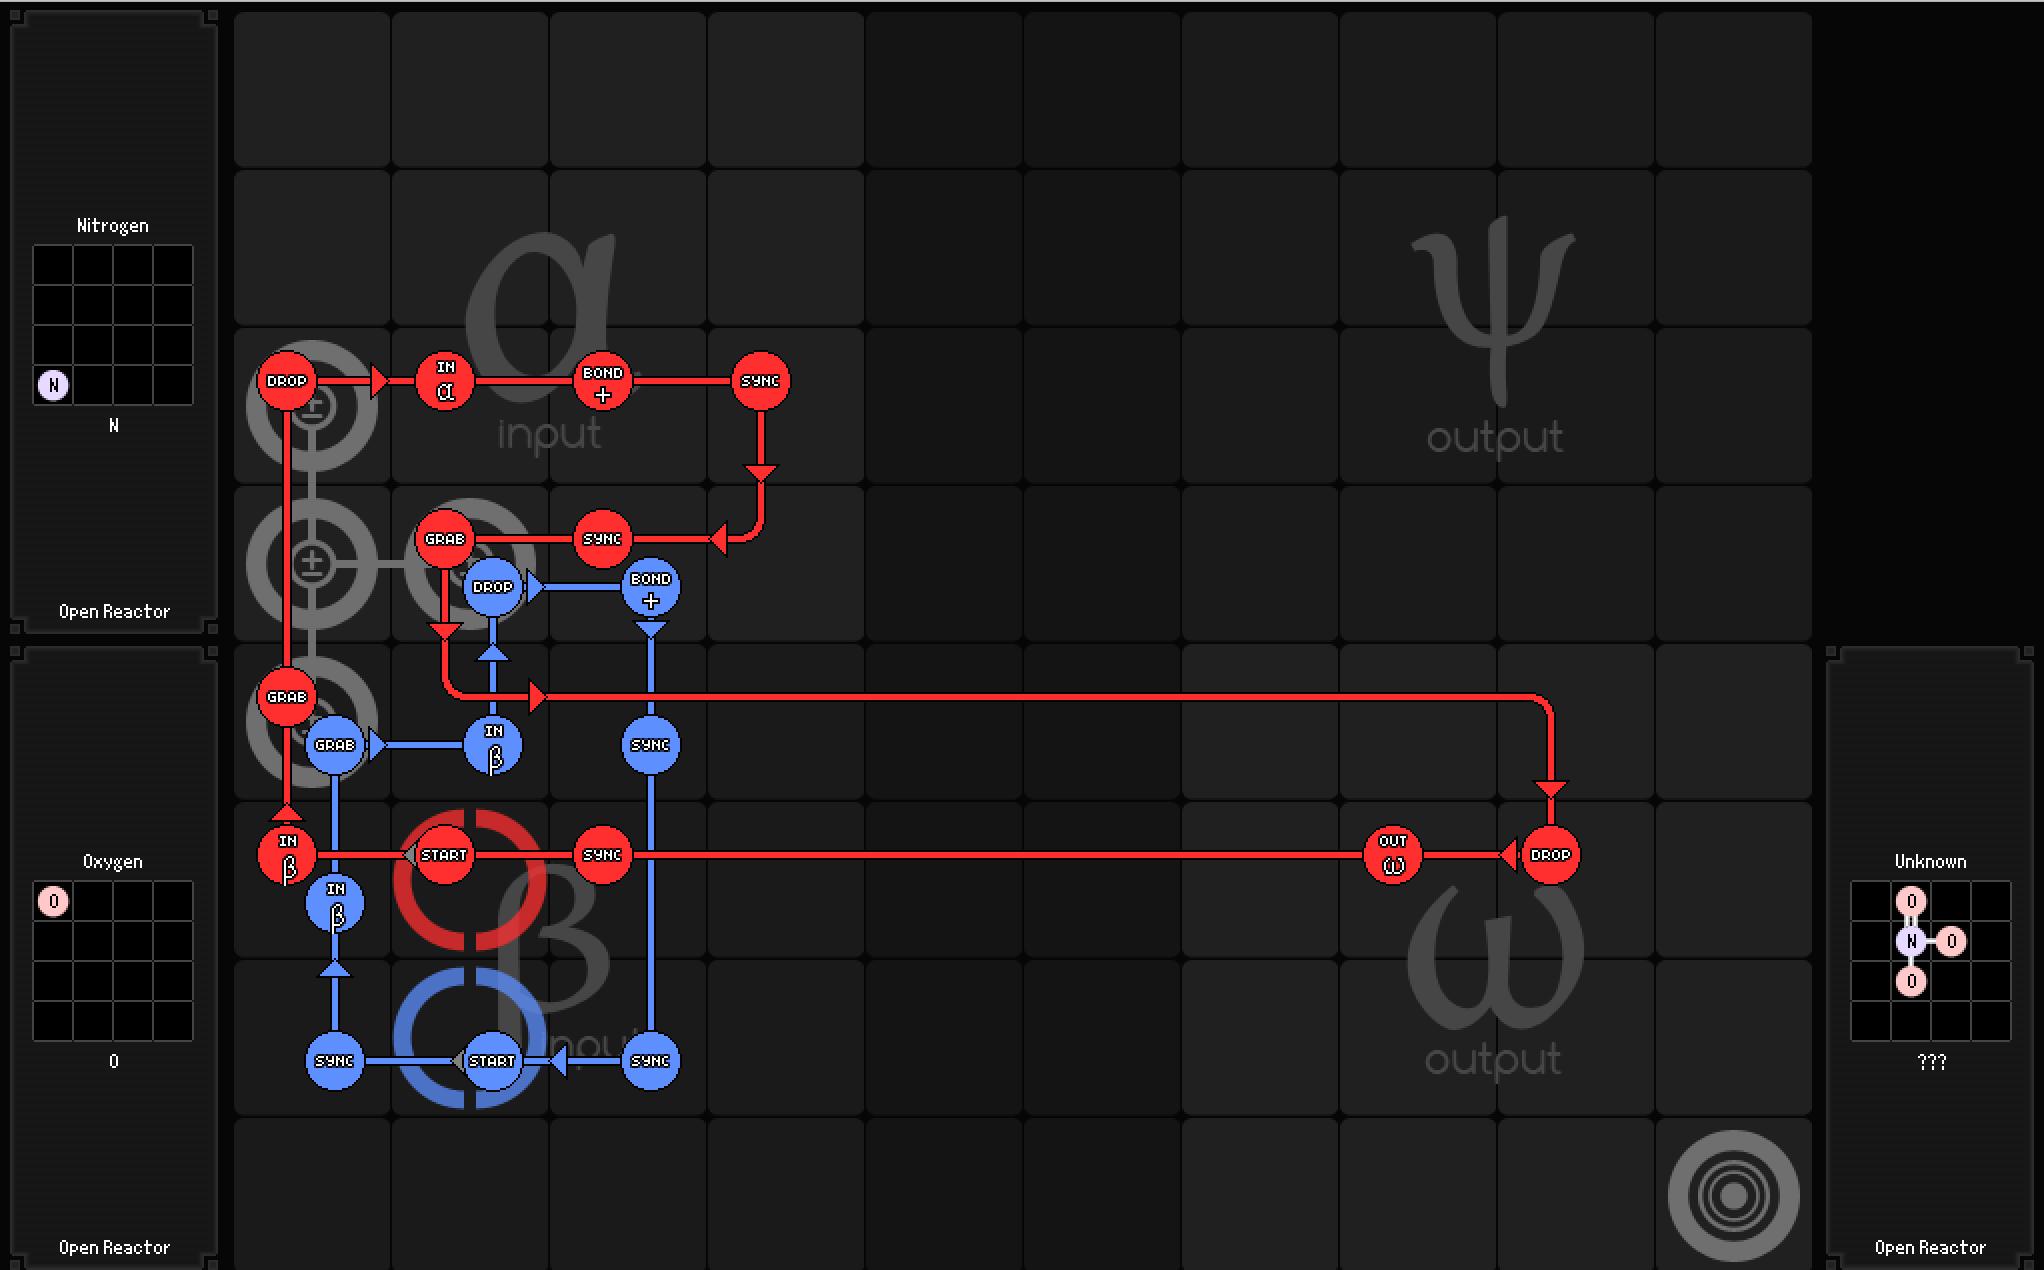 1_Story_Mode/4_Alkonost/SpaceChem-4.5.a/Reactor_2.png